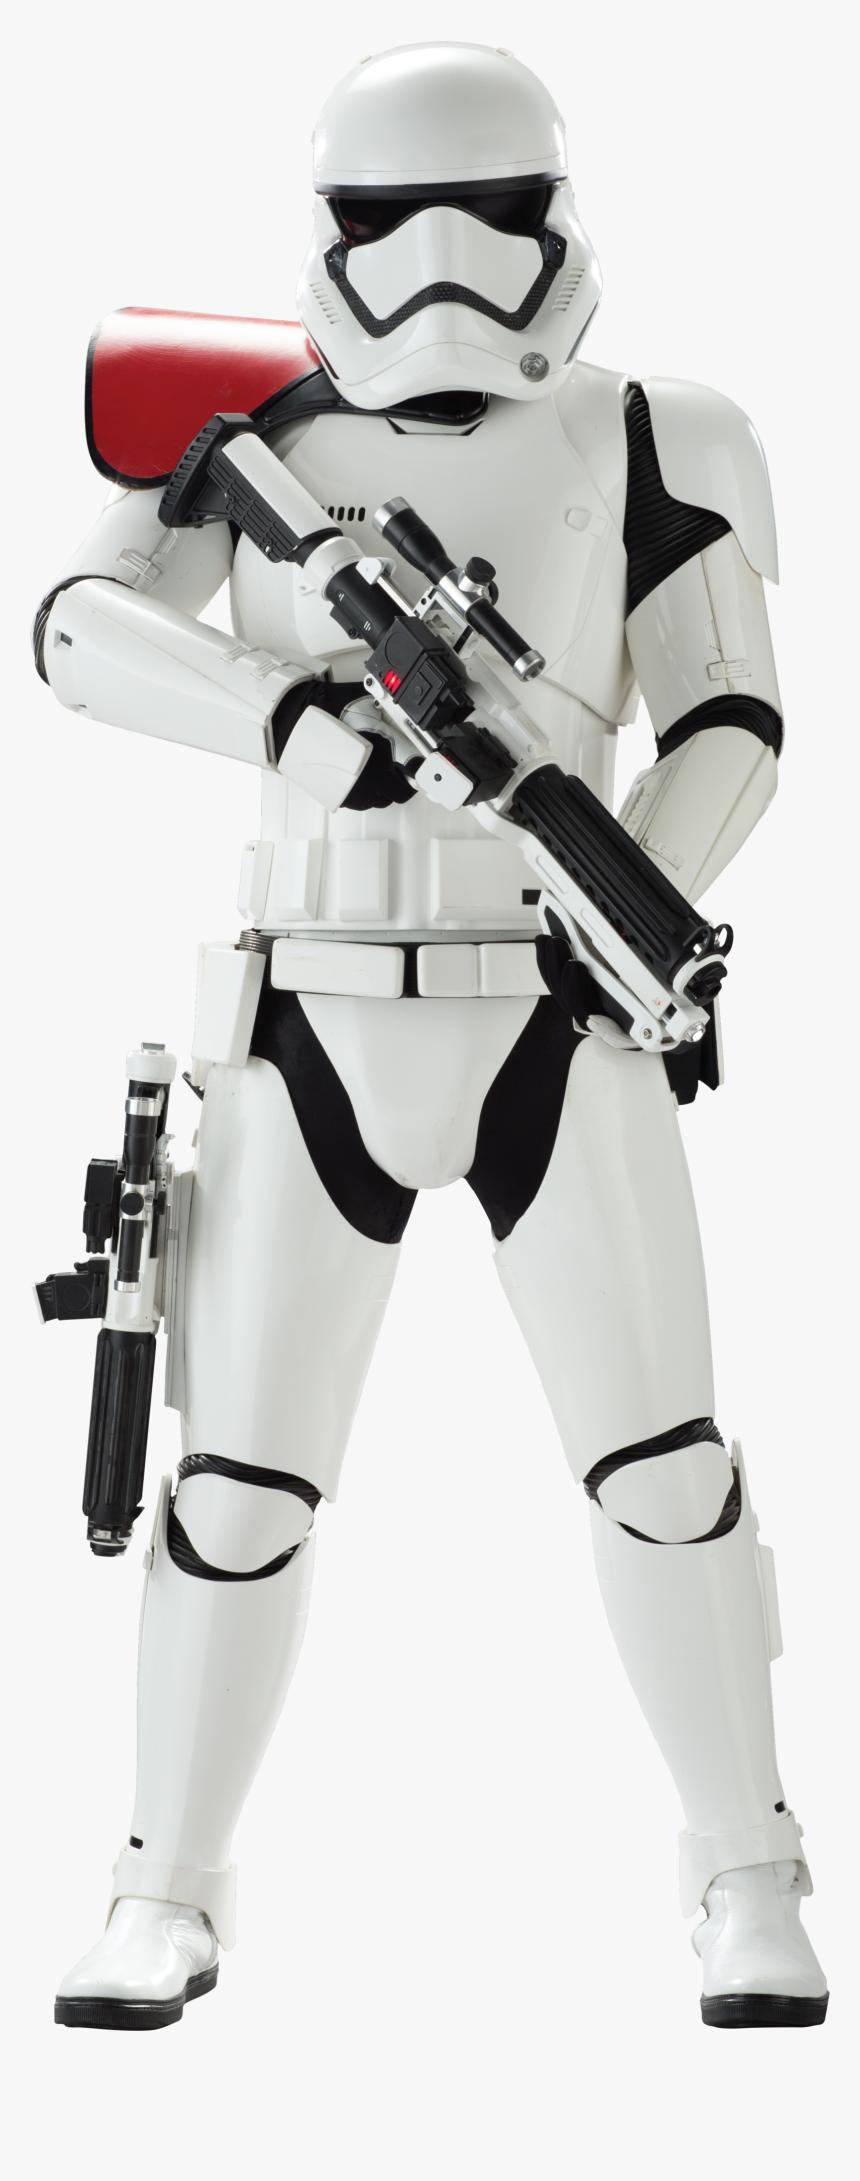 Stormtrooper Star Wars Png Pic - First Order Stormtrooper Officer, Transparent Png, Free Download